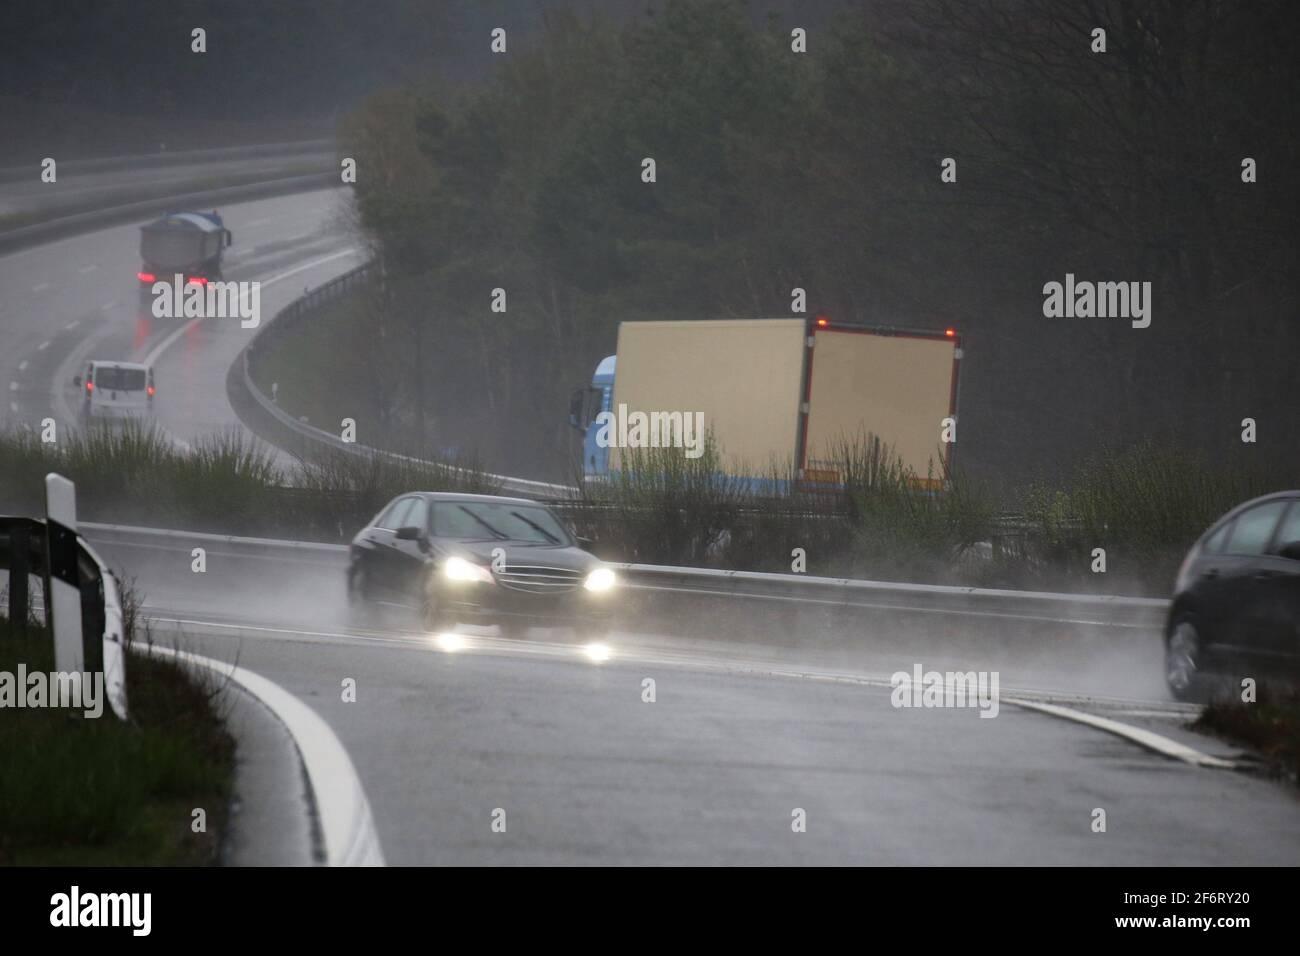 Rain slicked motorway in Germany. Stock Photo